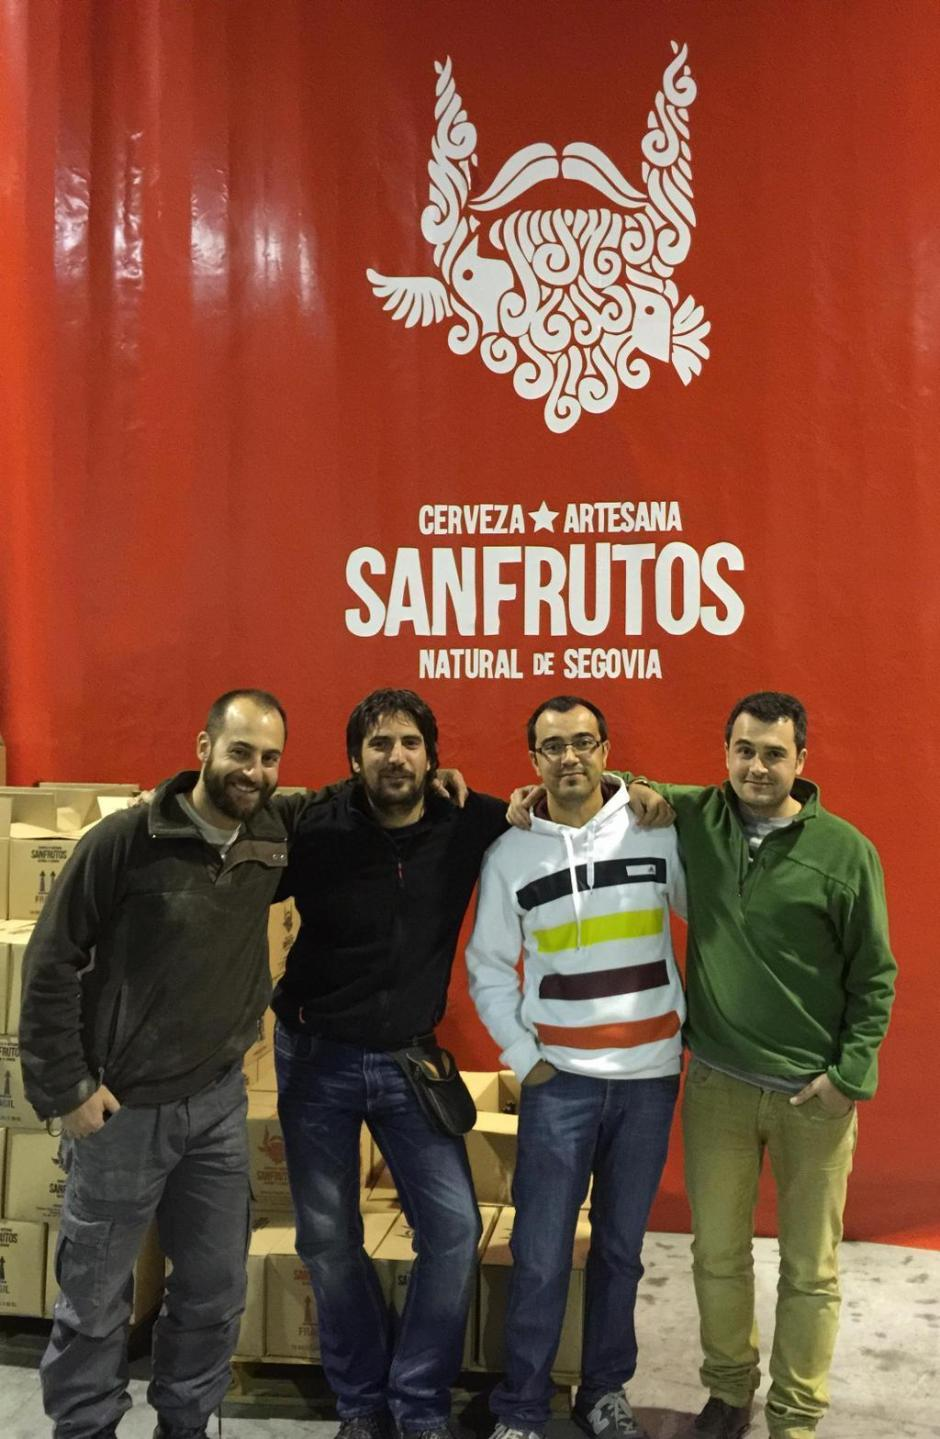 De izquierda a derecha: Mateo, Anselmo (Hans), Jorge (Craufurd) y Adrian